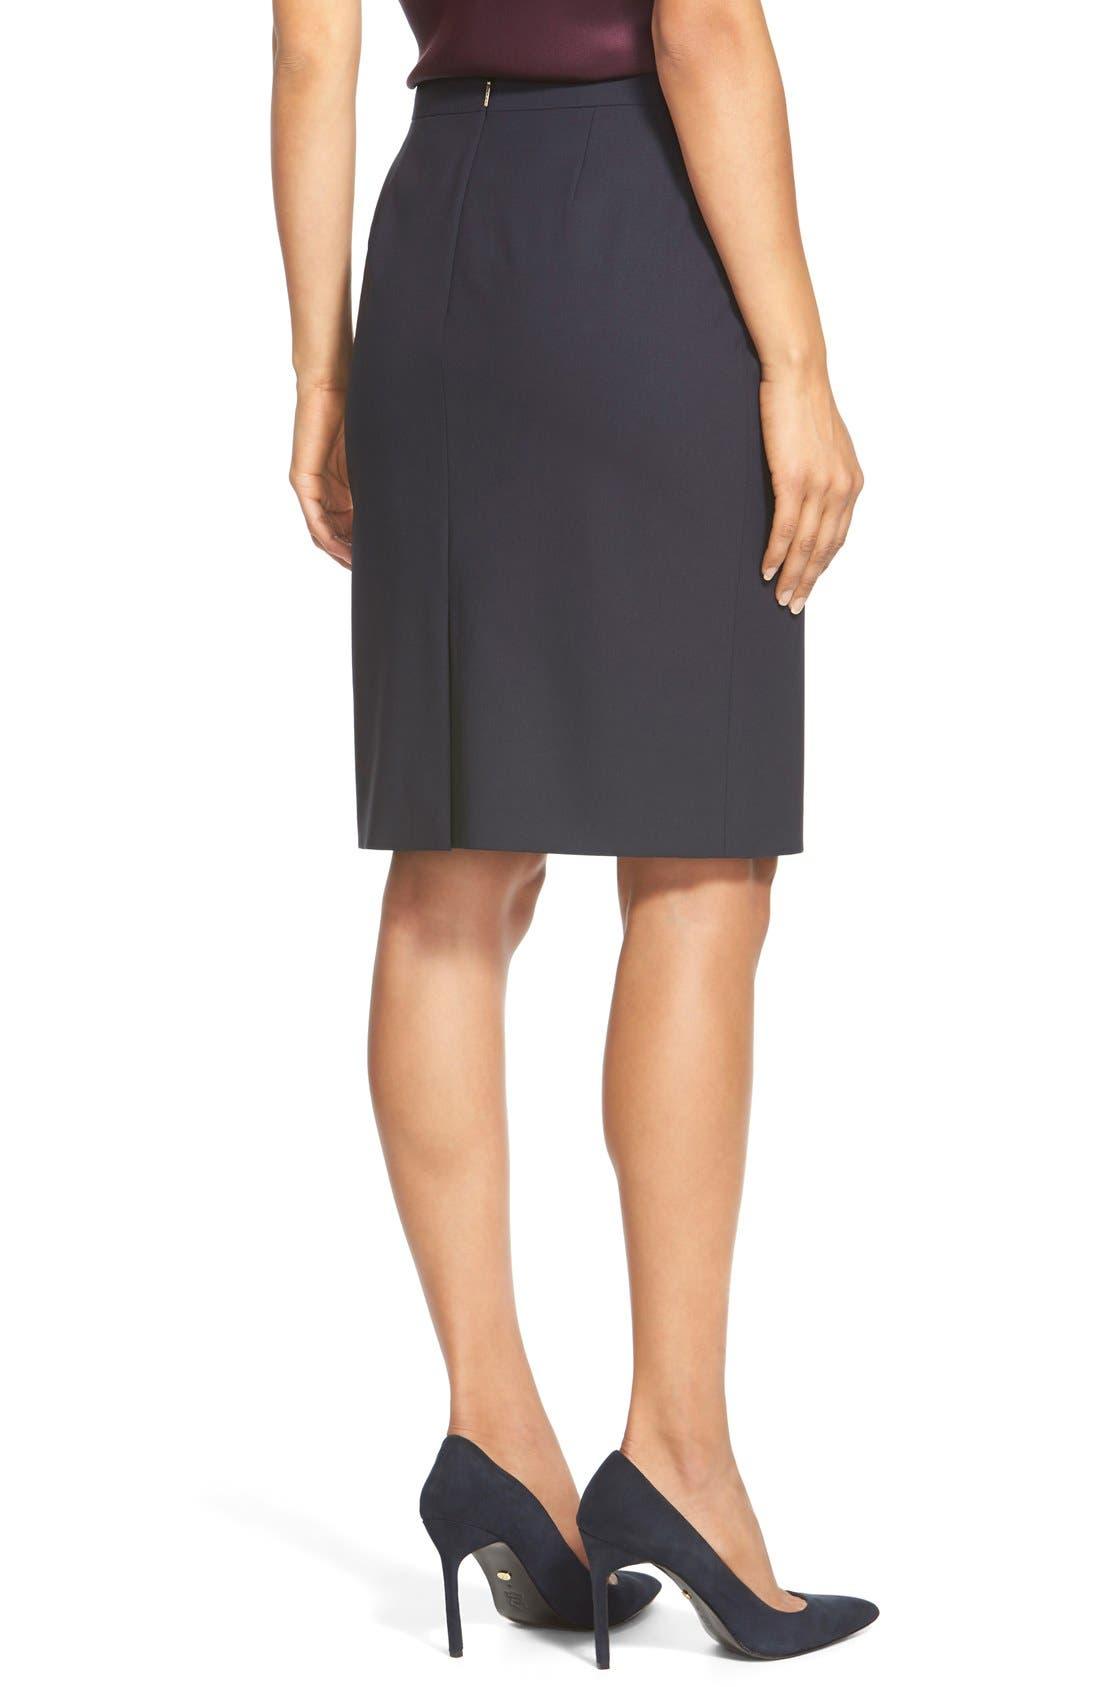 Vilea Tropical Stretch Wool Pencil Skirt,                             Alternate thumbnail 12, color,